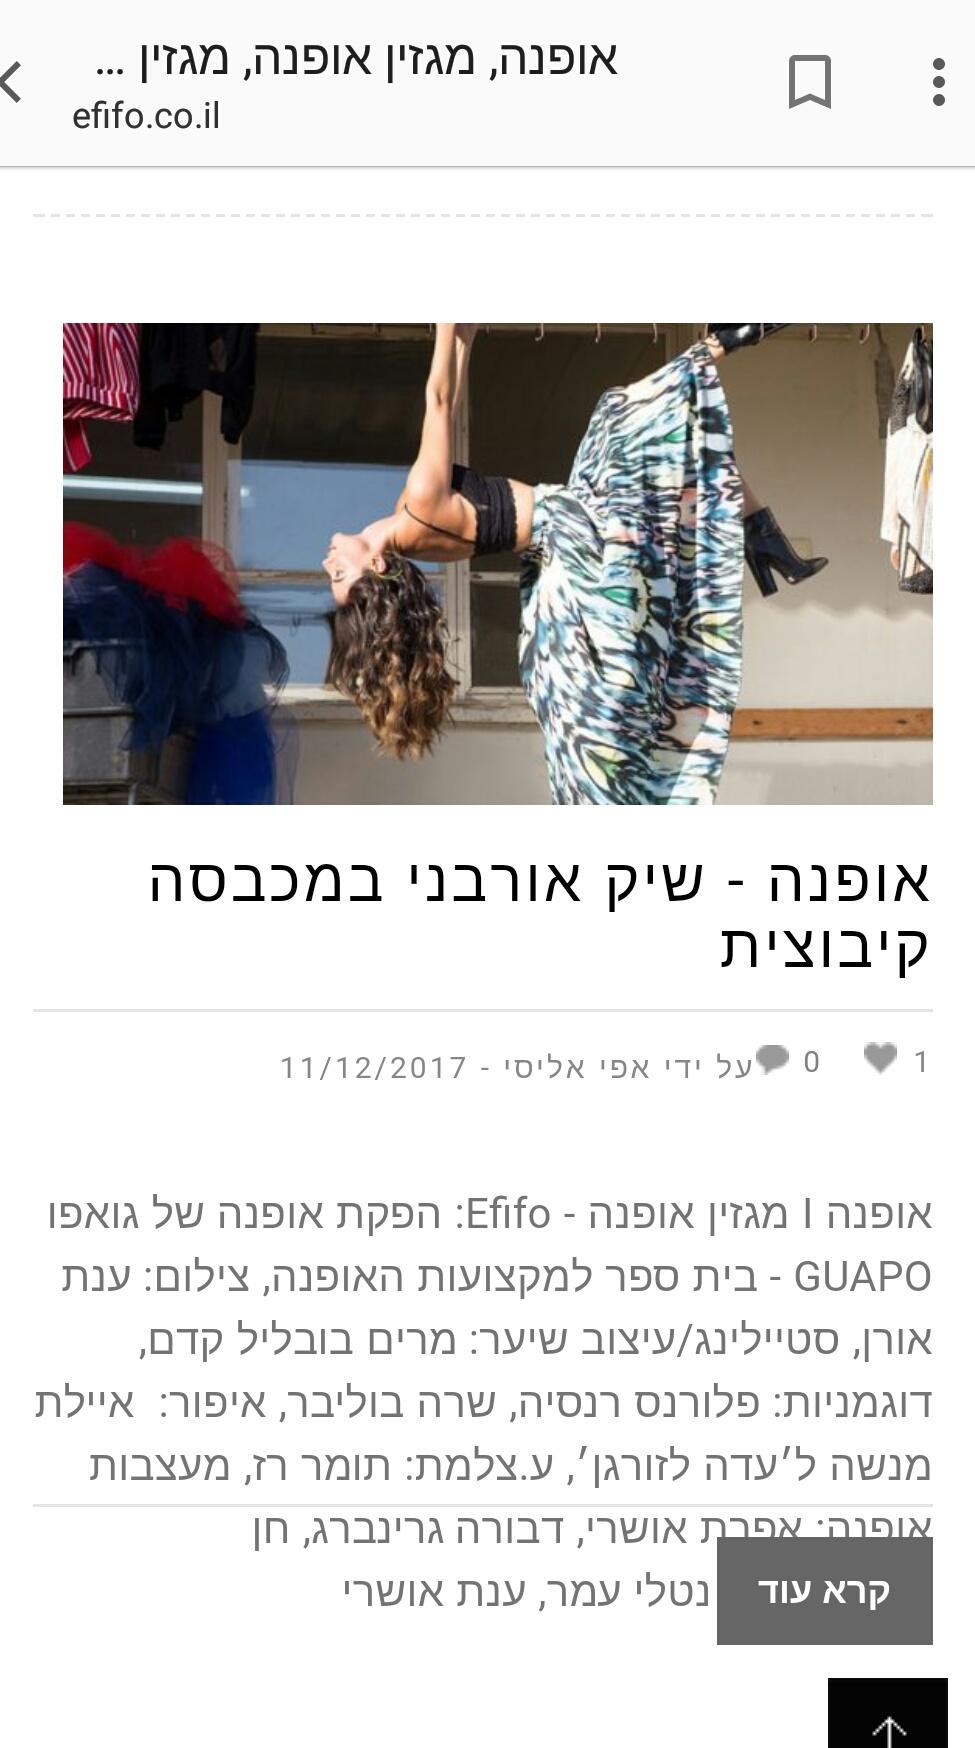 EFIFO - מגזין האופנה של ישראל